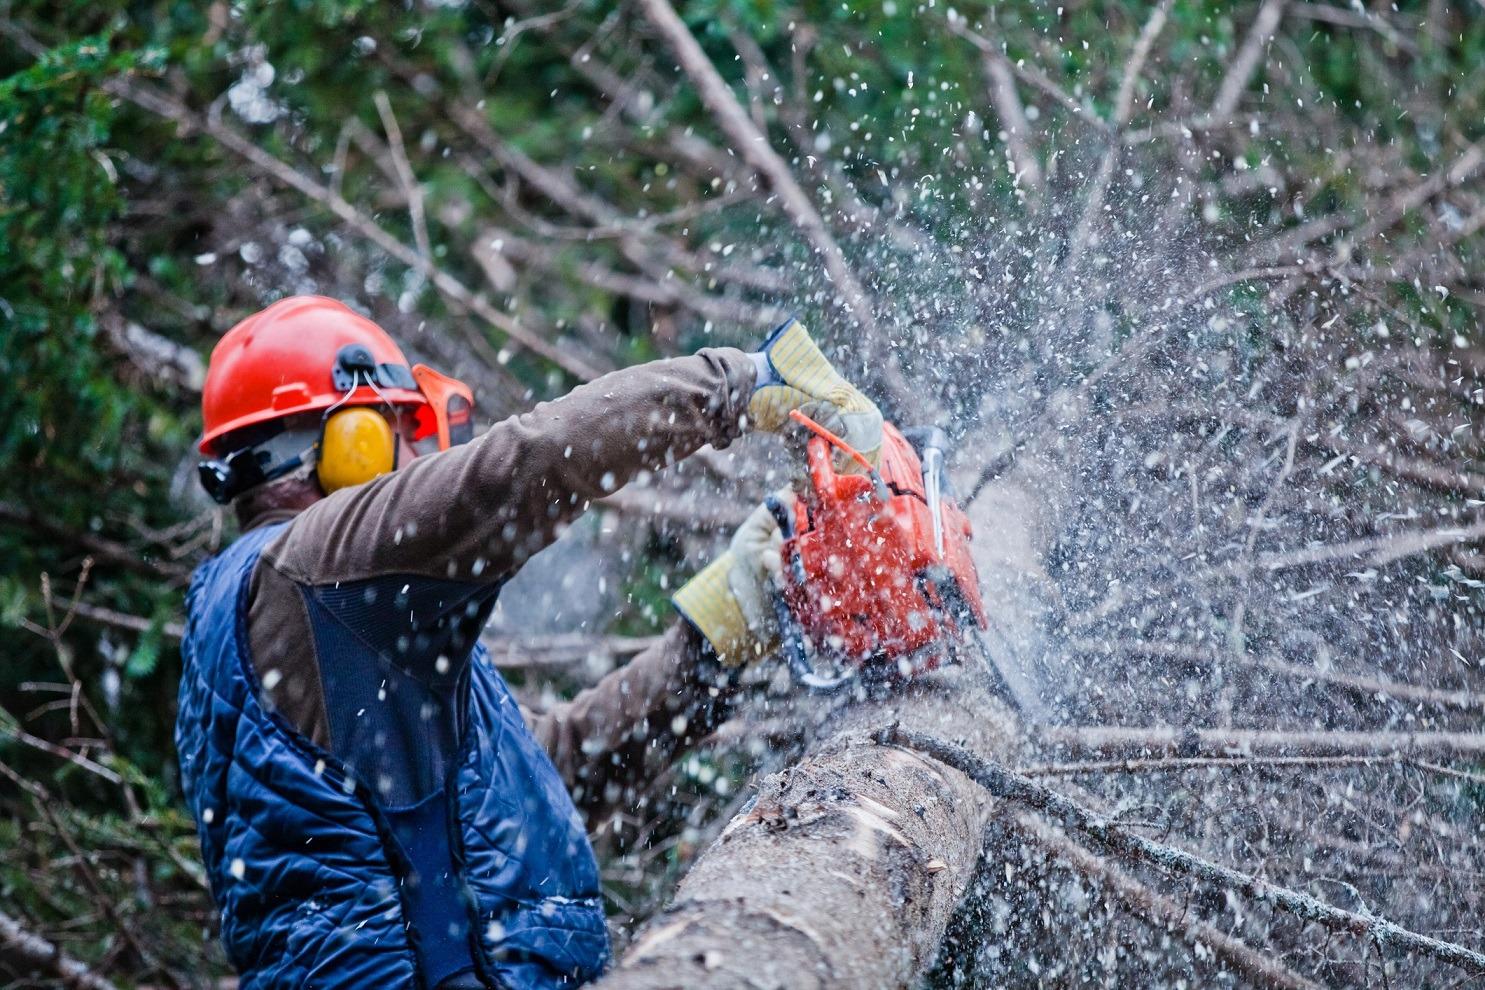 Lumberjack or logger cutting tree